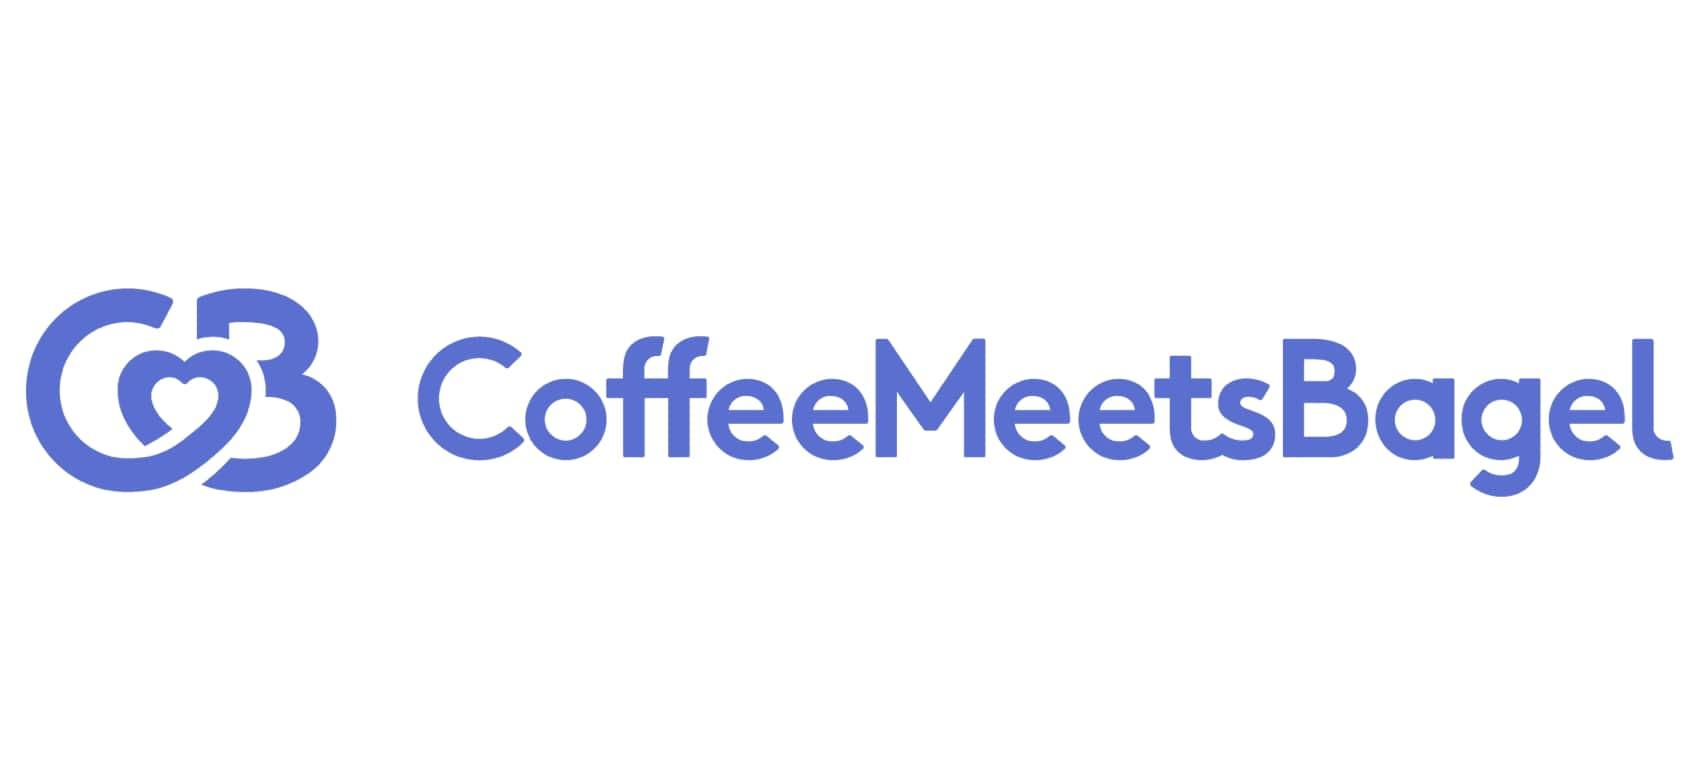 Coffee Meets Bagel: دليل مستخدم تطبيق المواعدة